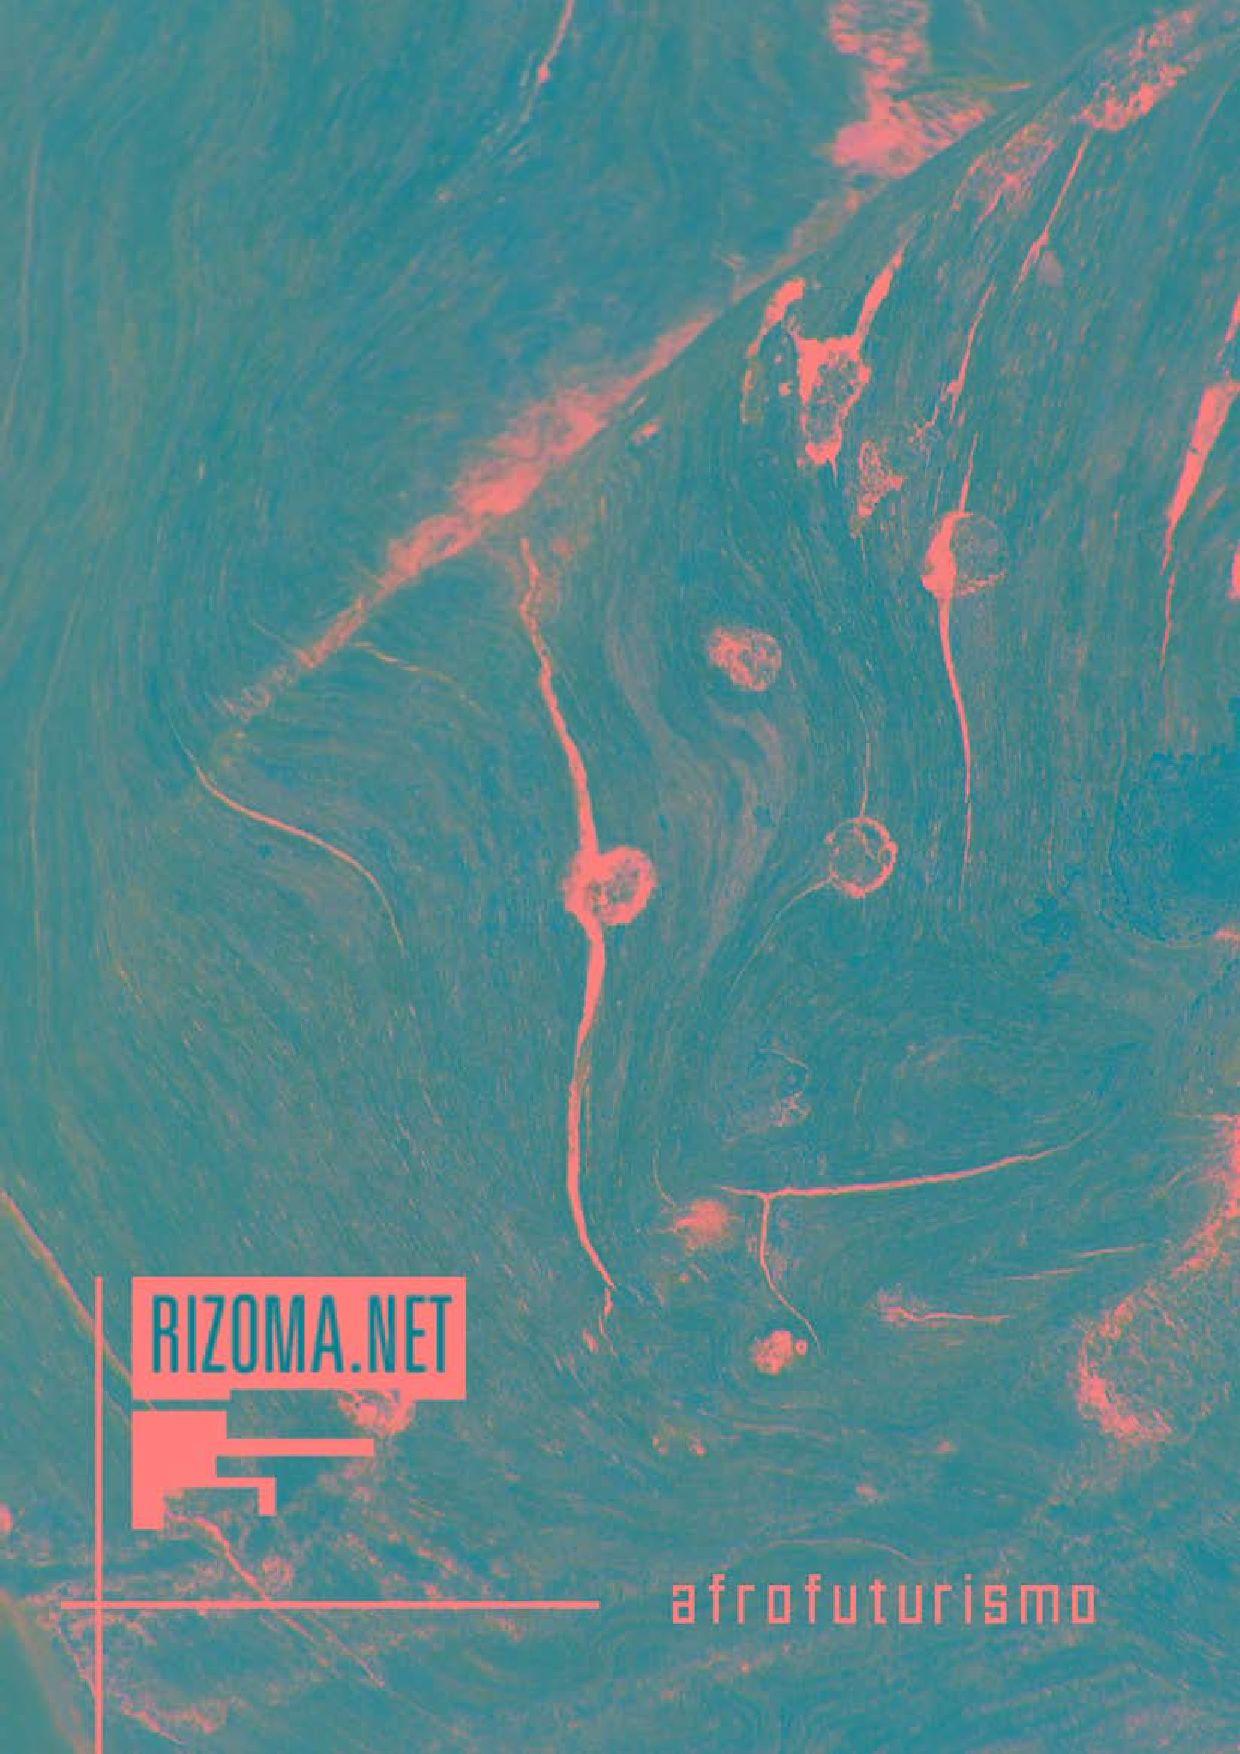 33901015b3776 RIZOMA.NET - Afrofuturismo by Anonimos e Etc - issuu